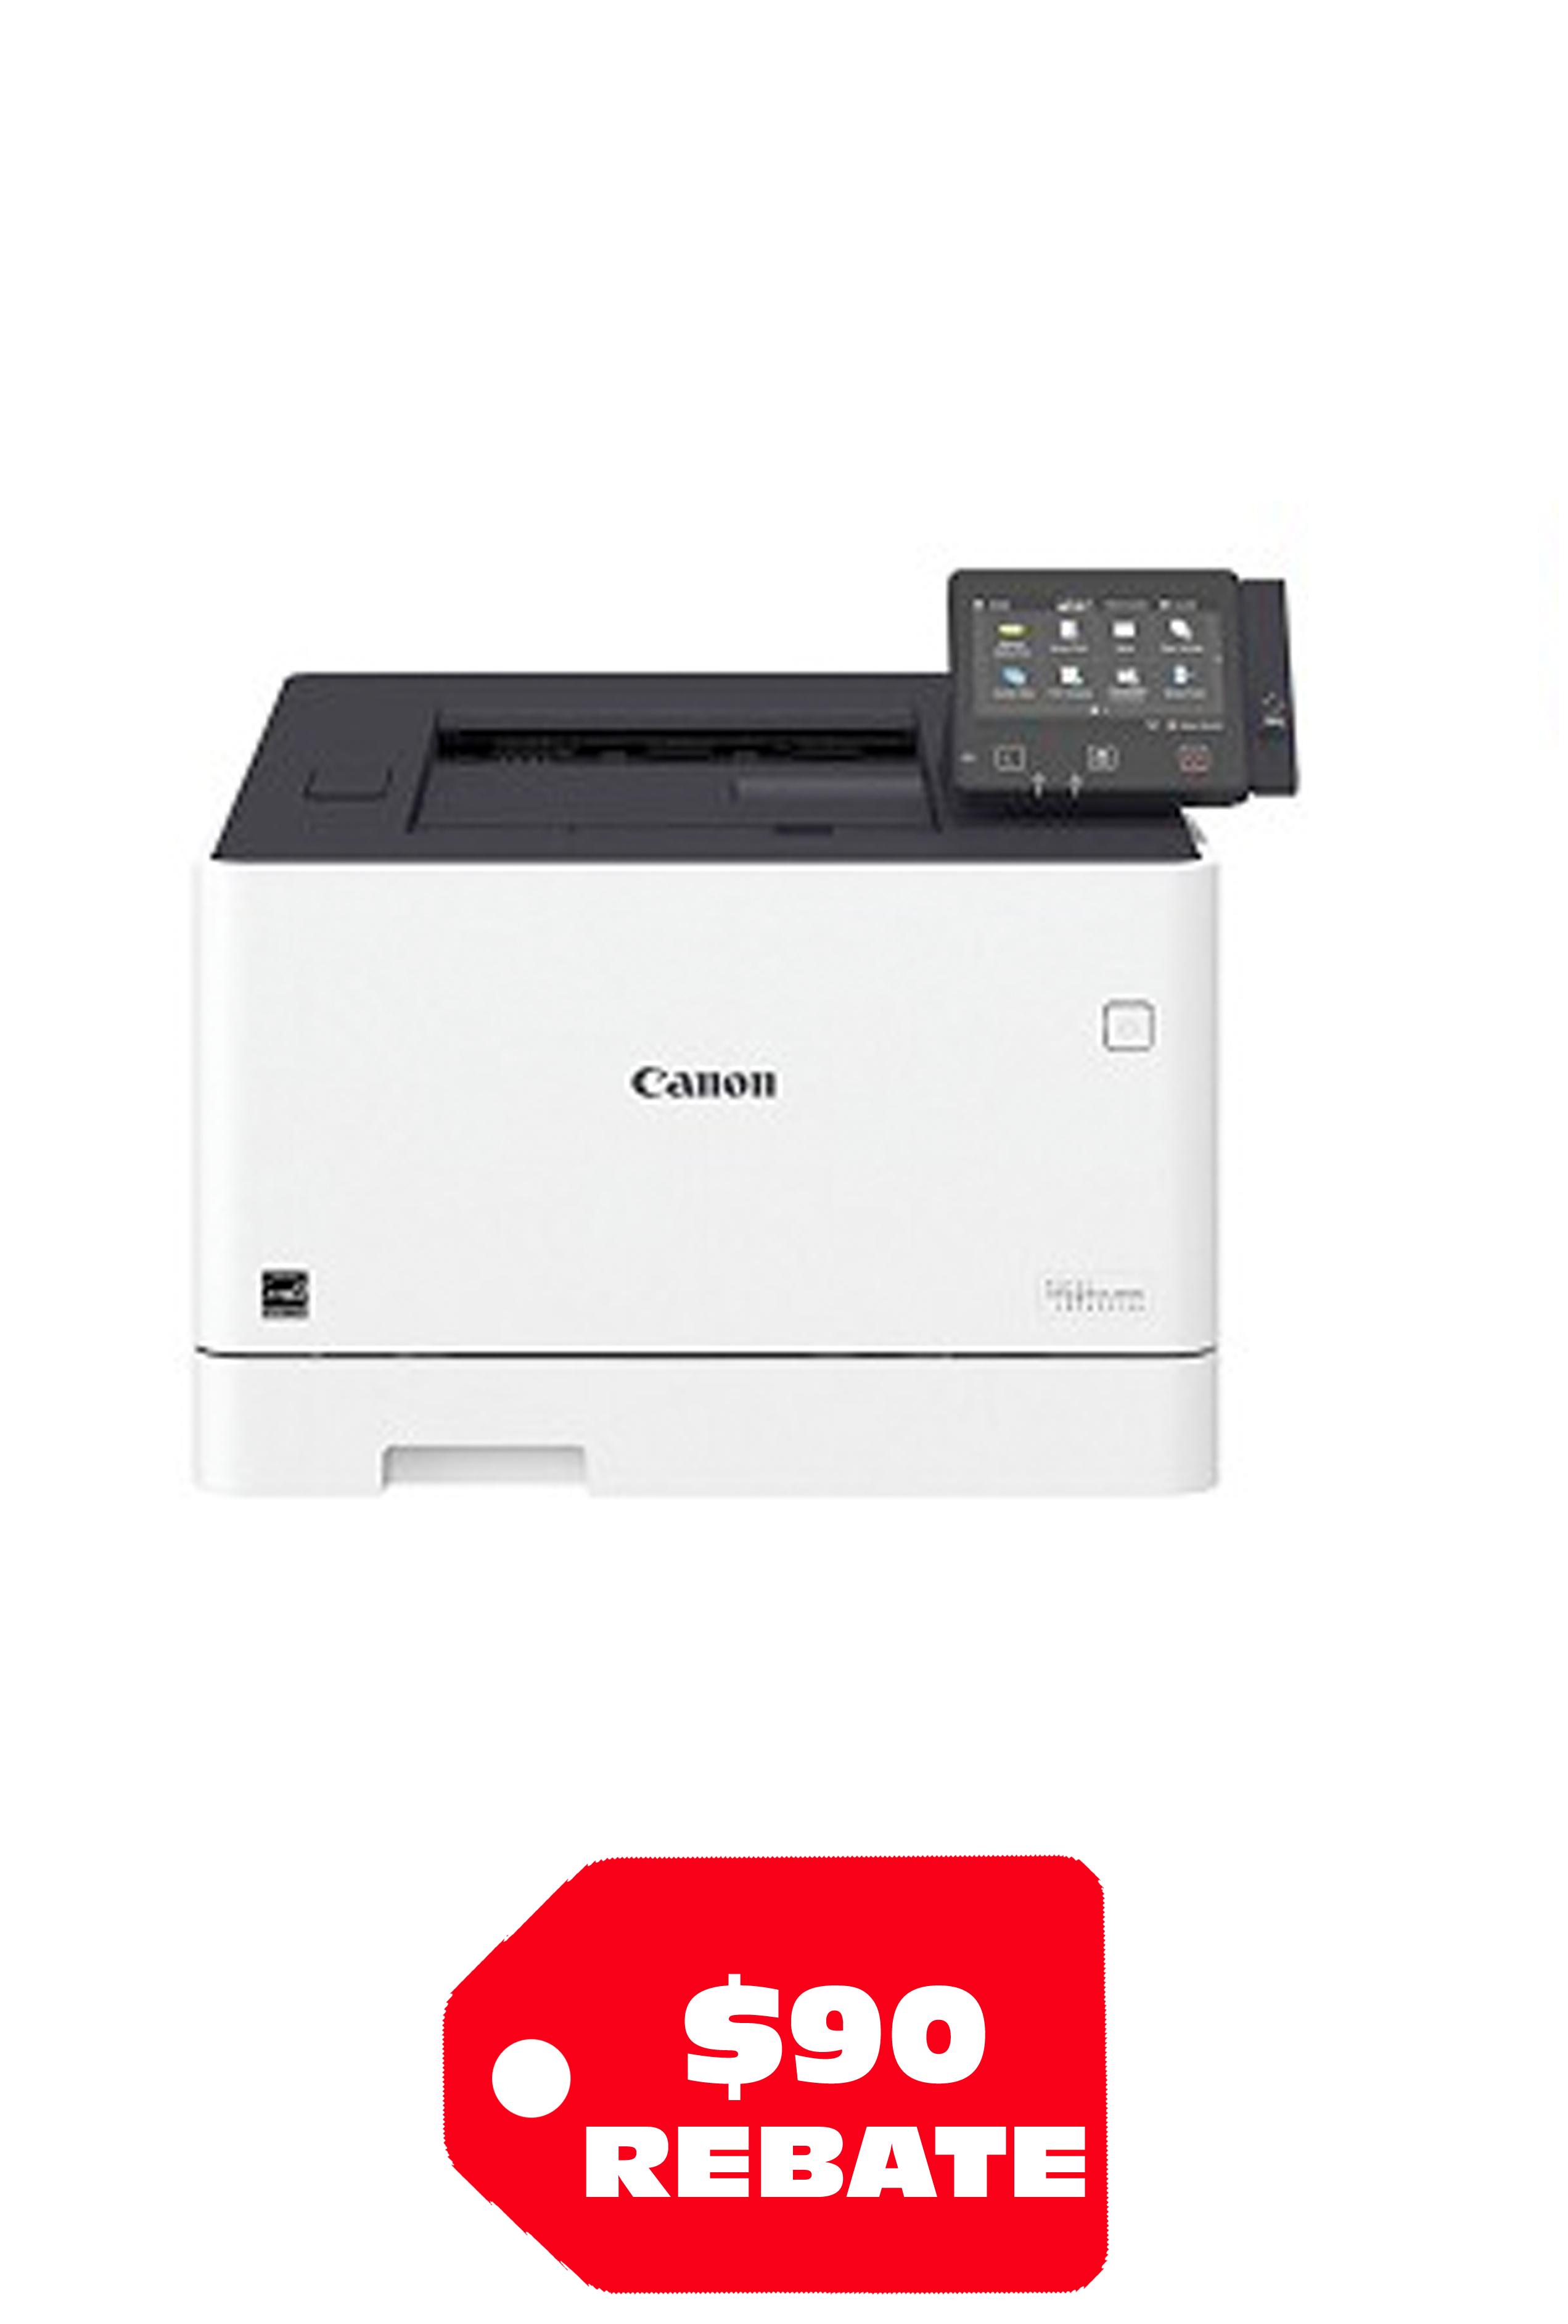 Canon imageCLASS LBP654Cdw (28 ppm)